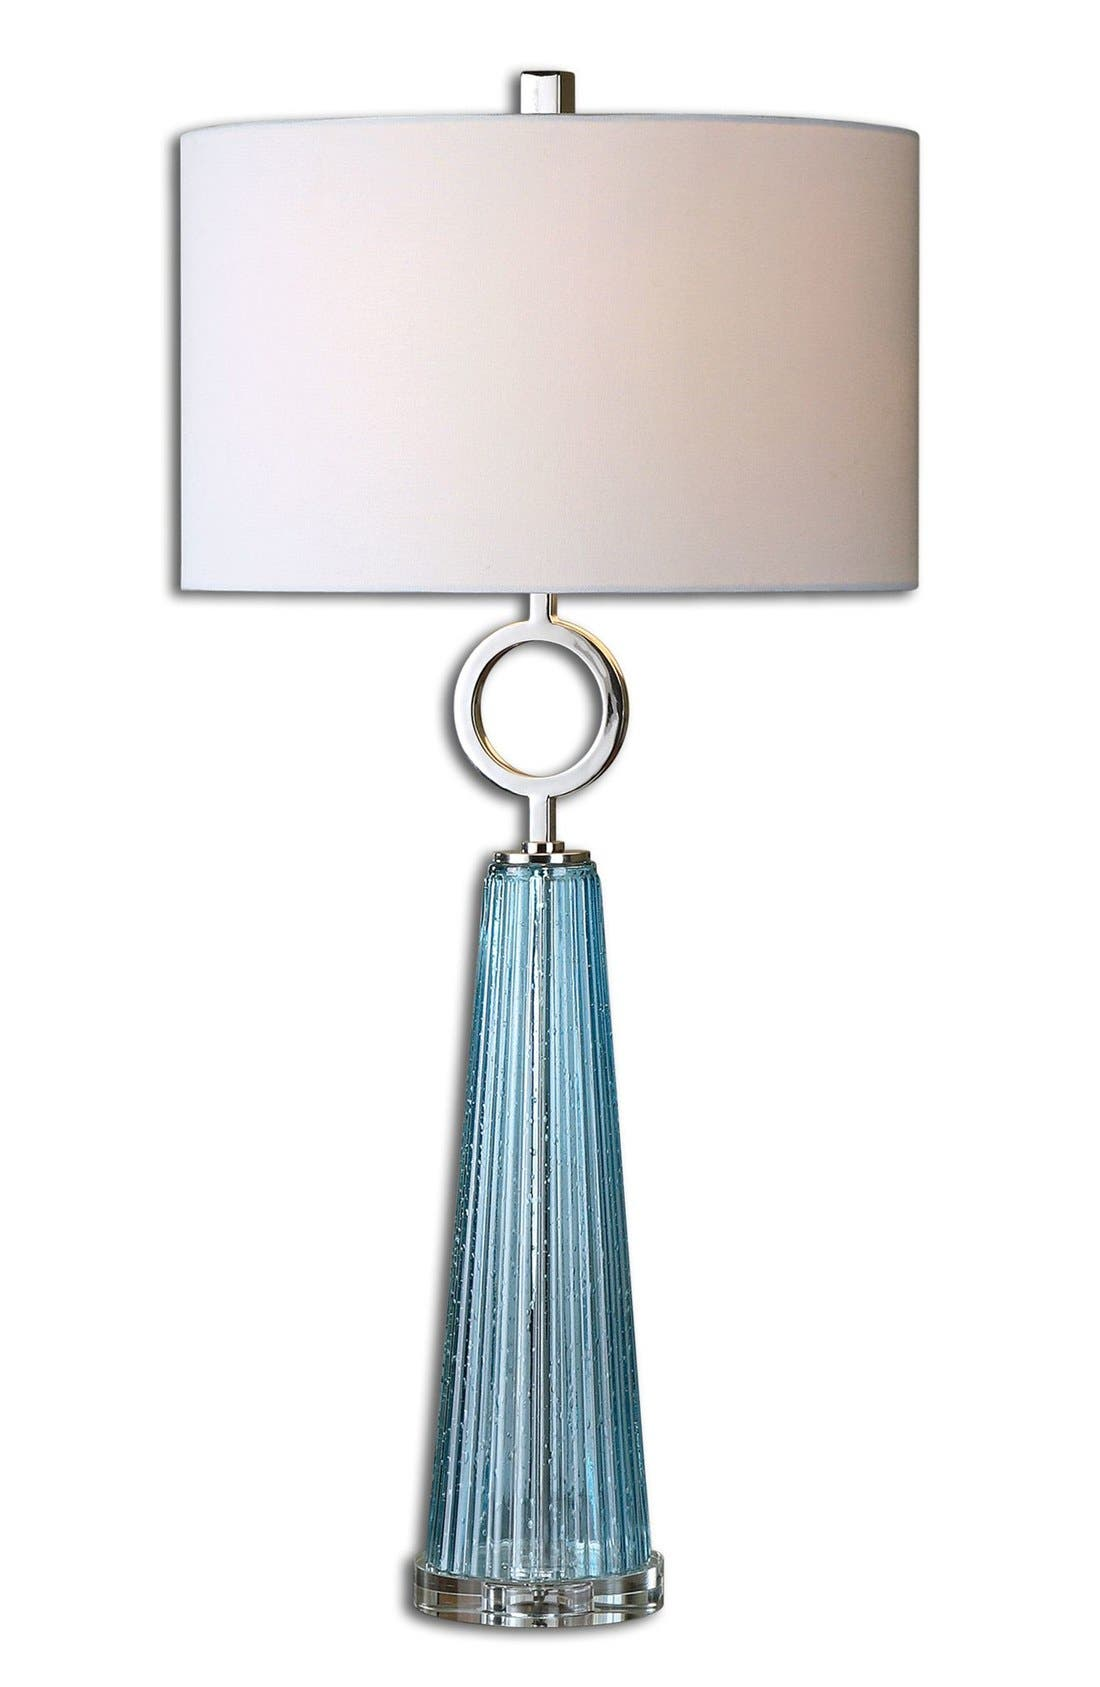 'Navier' Seed Glass & Metallic Table Lamp,                             Main thumbnail 1, color,                             400